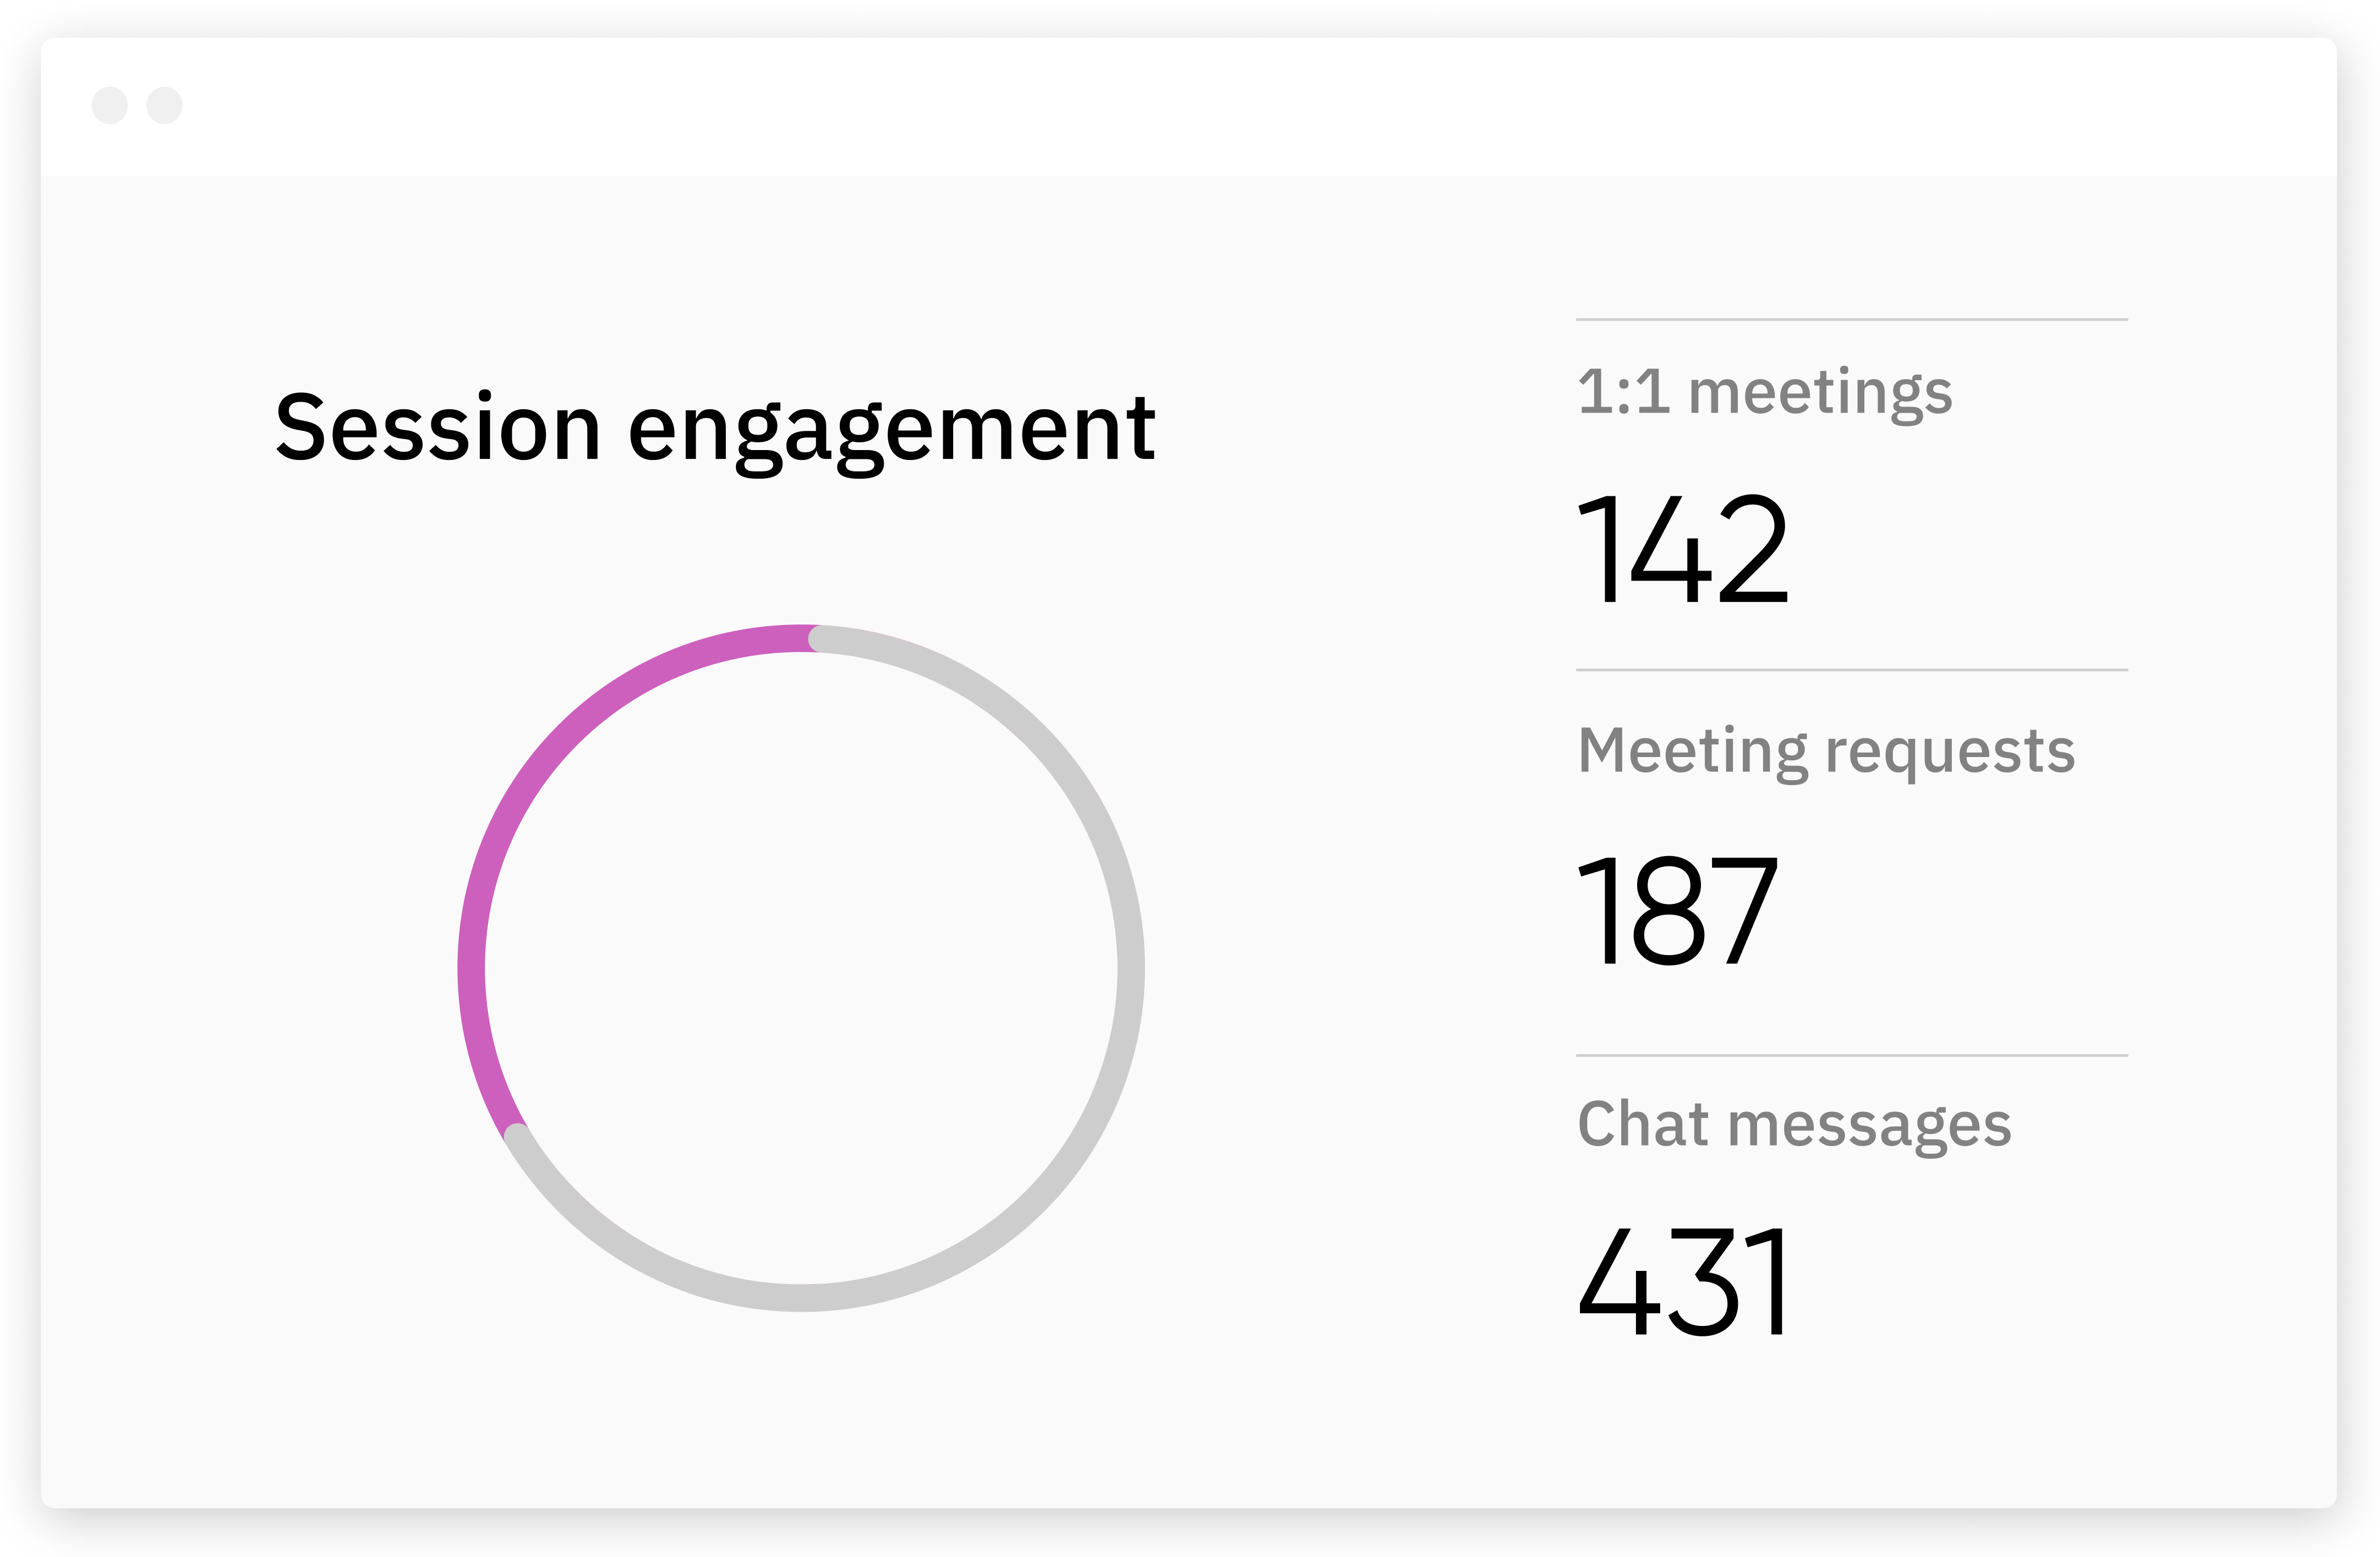 Sponsored session analytics